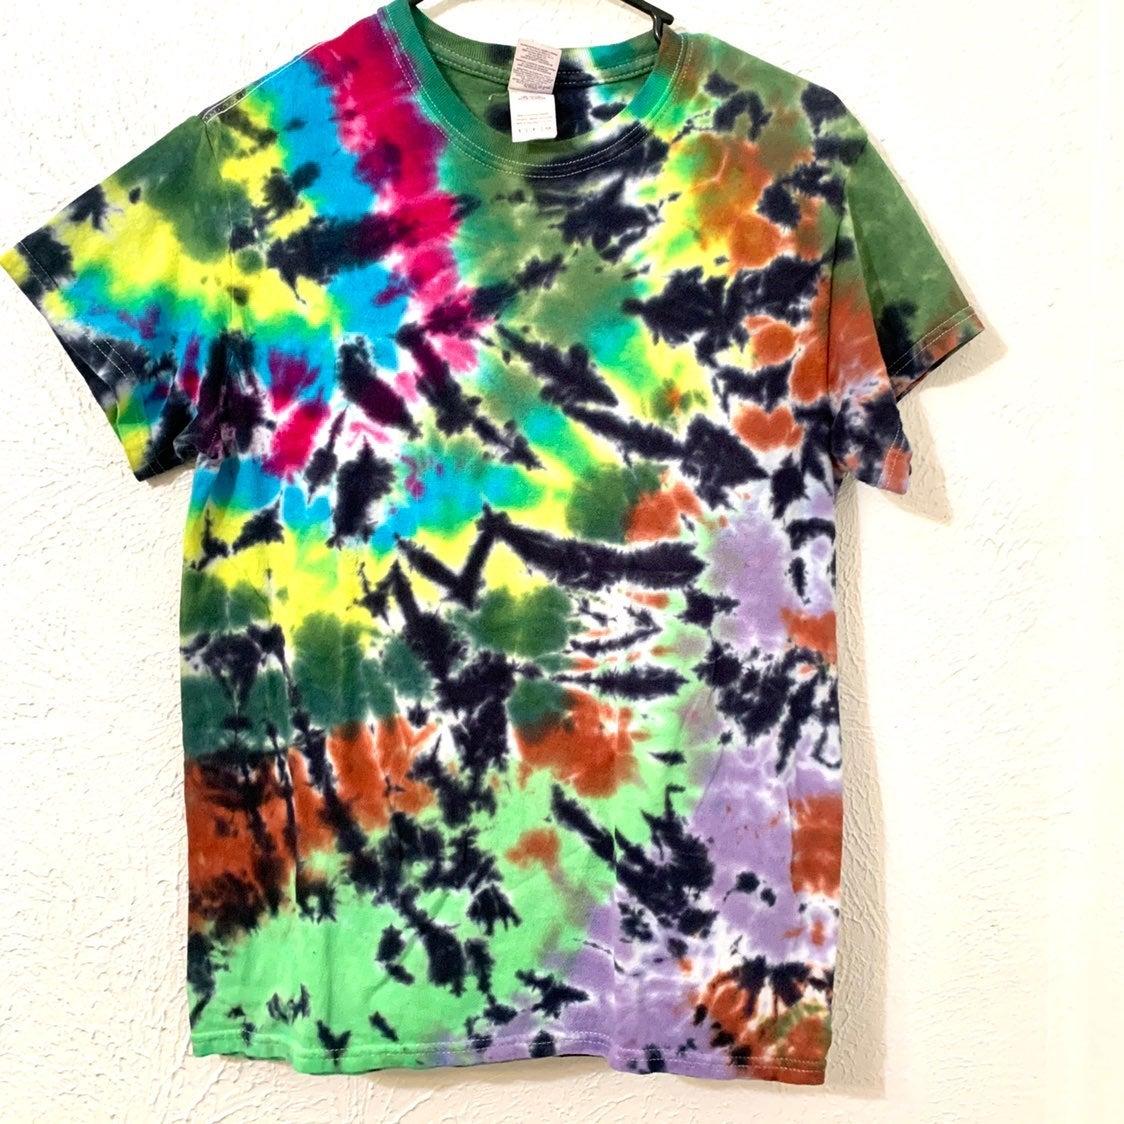 Gildan Tye Dye Shirt Small